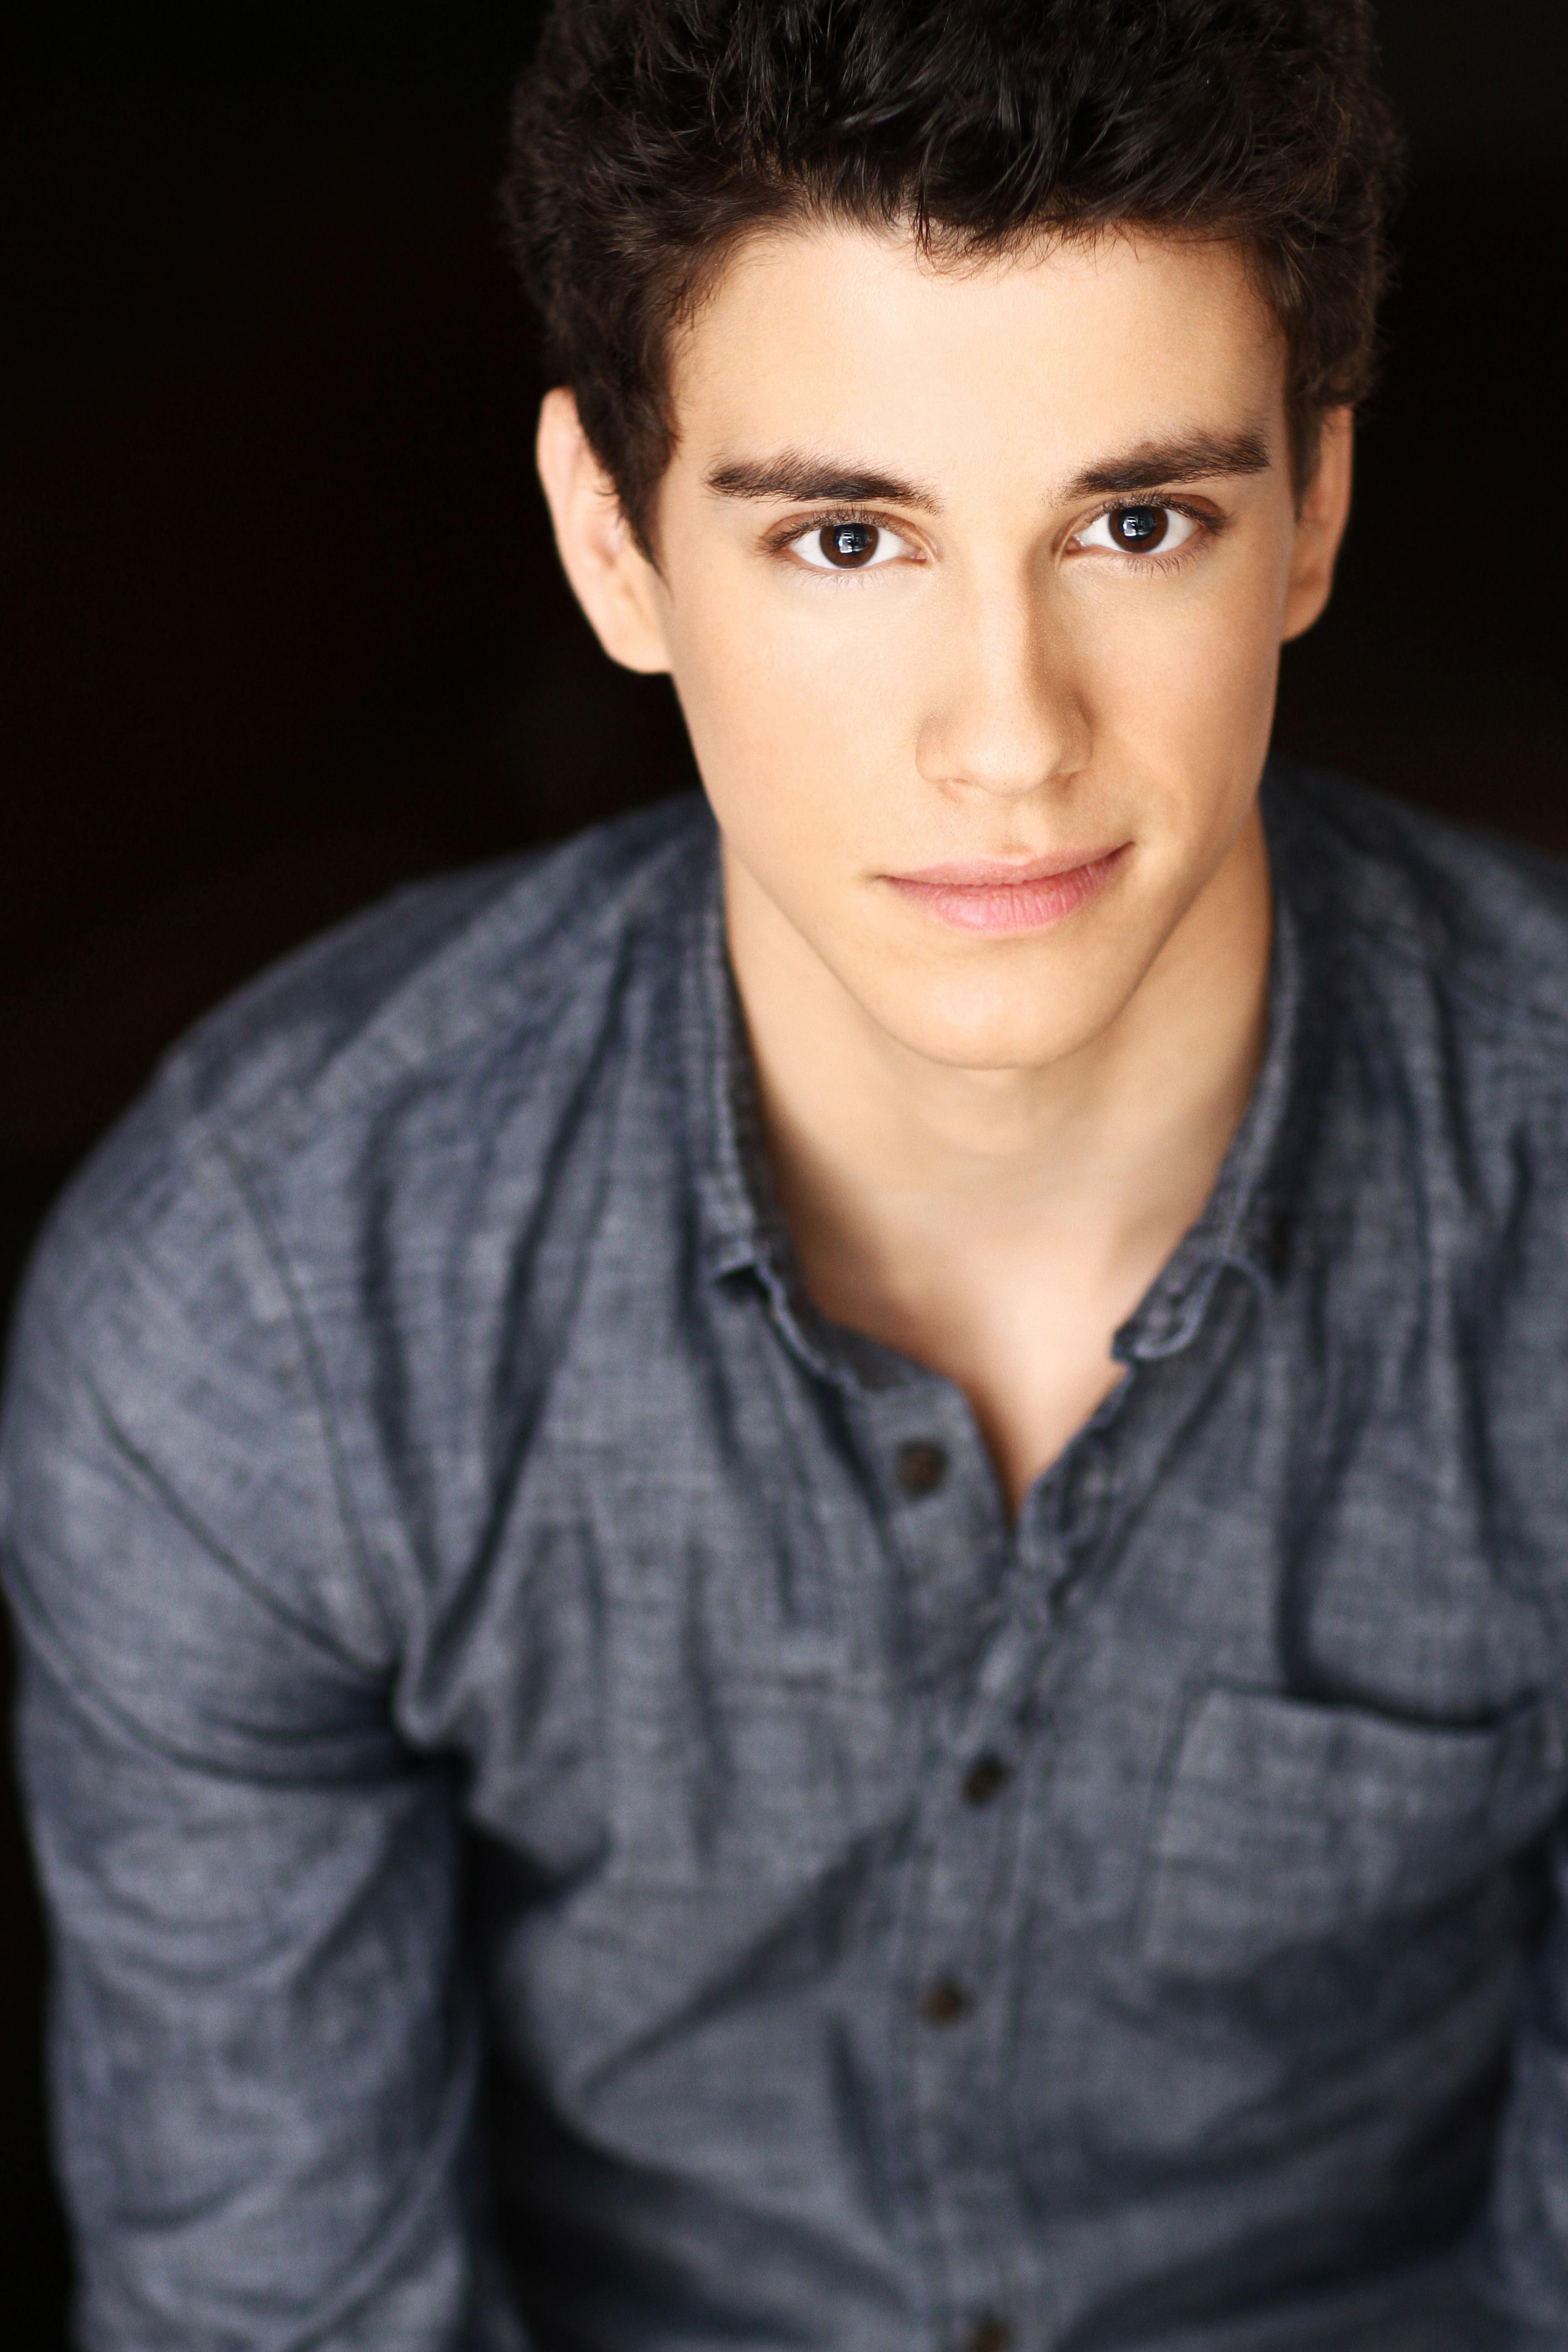 General photo of Adam DiMarco